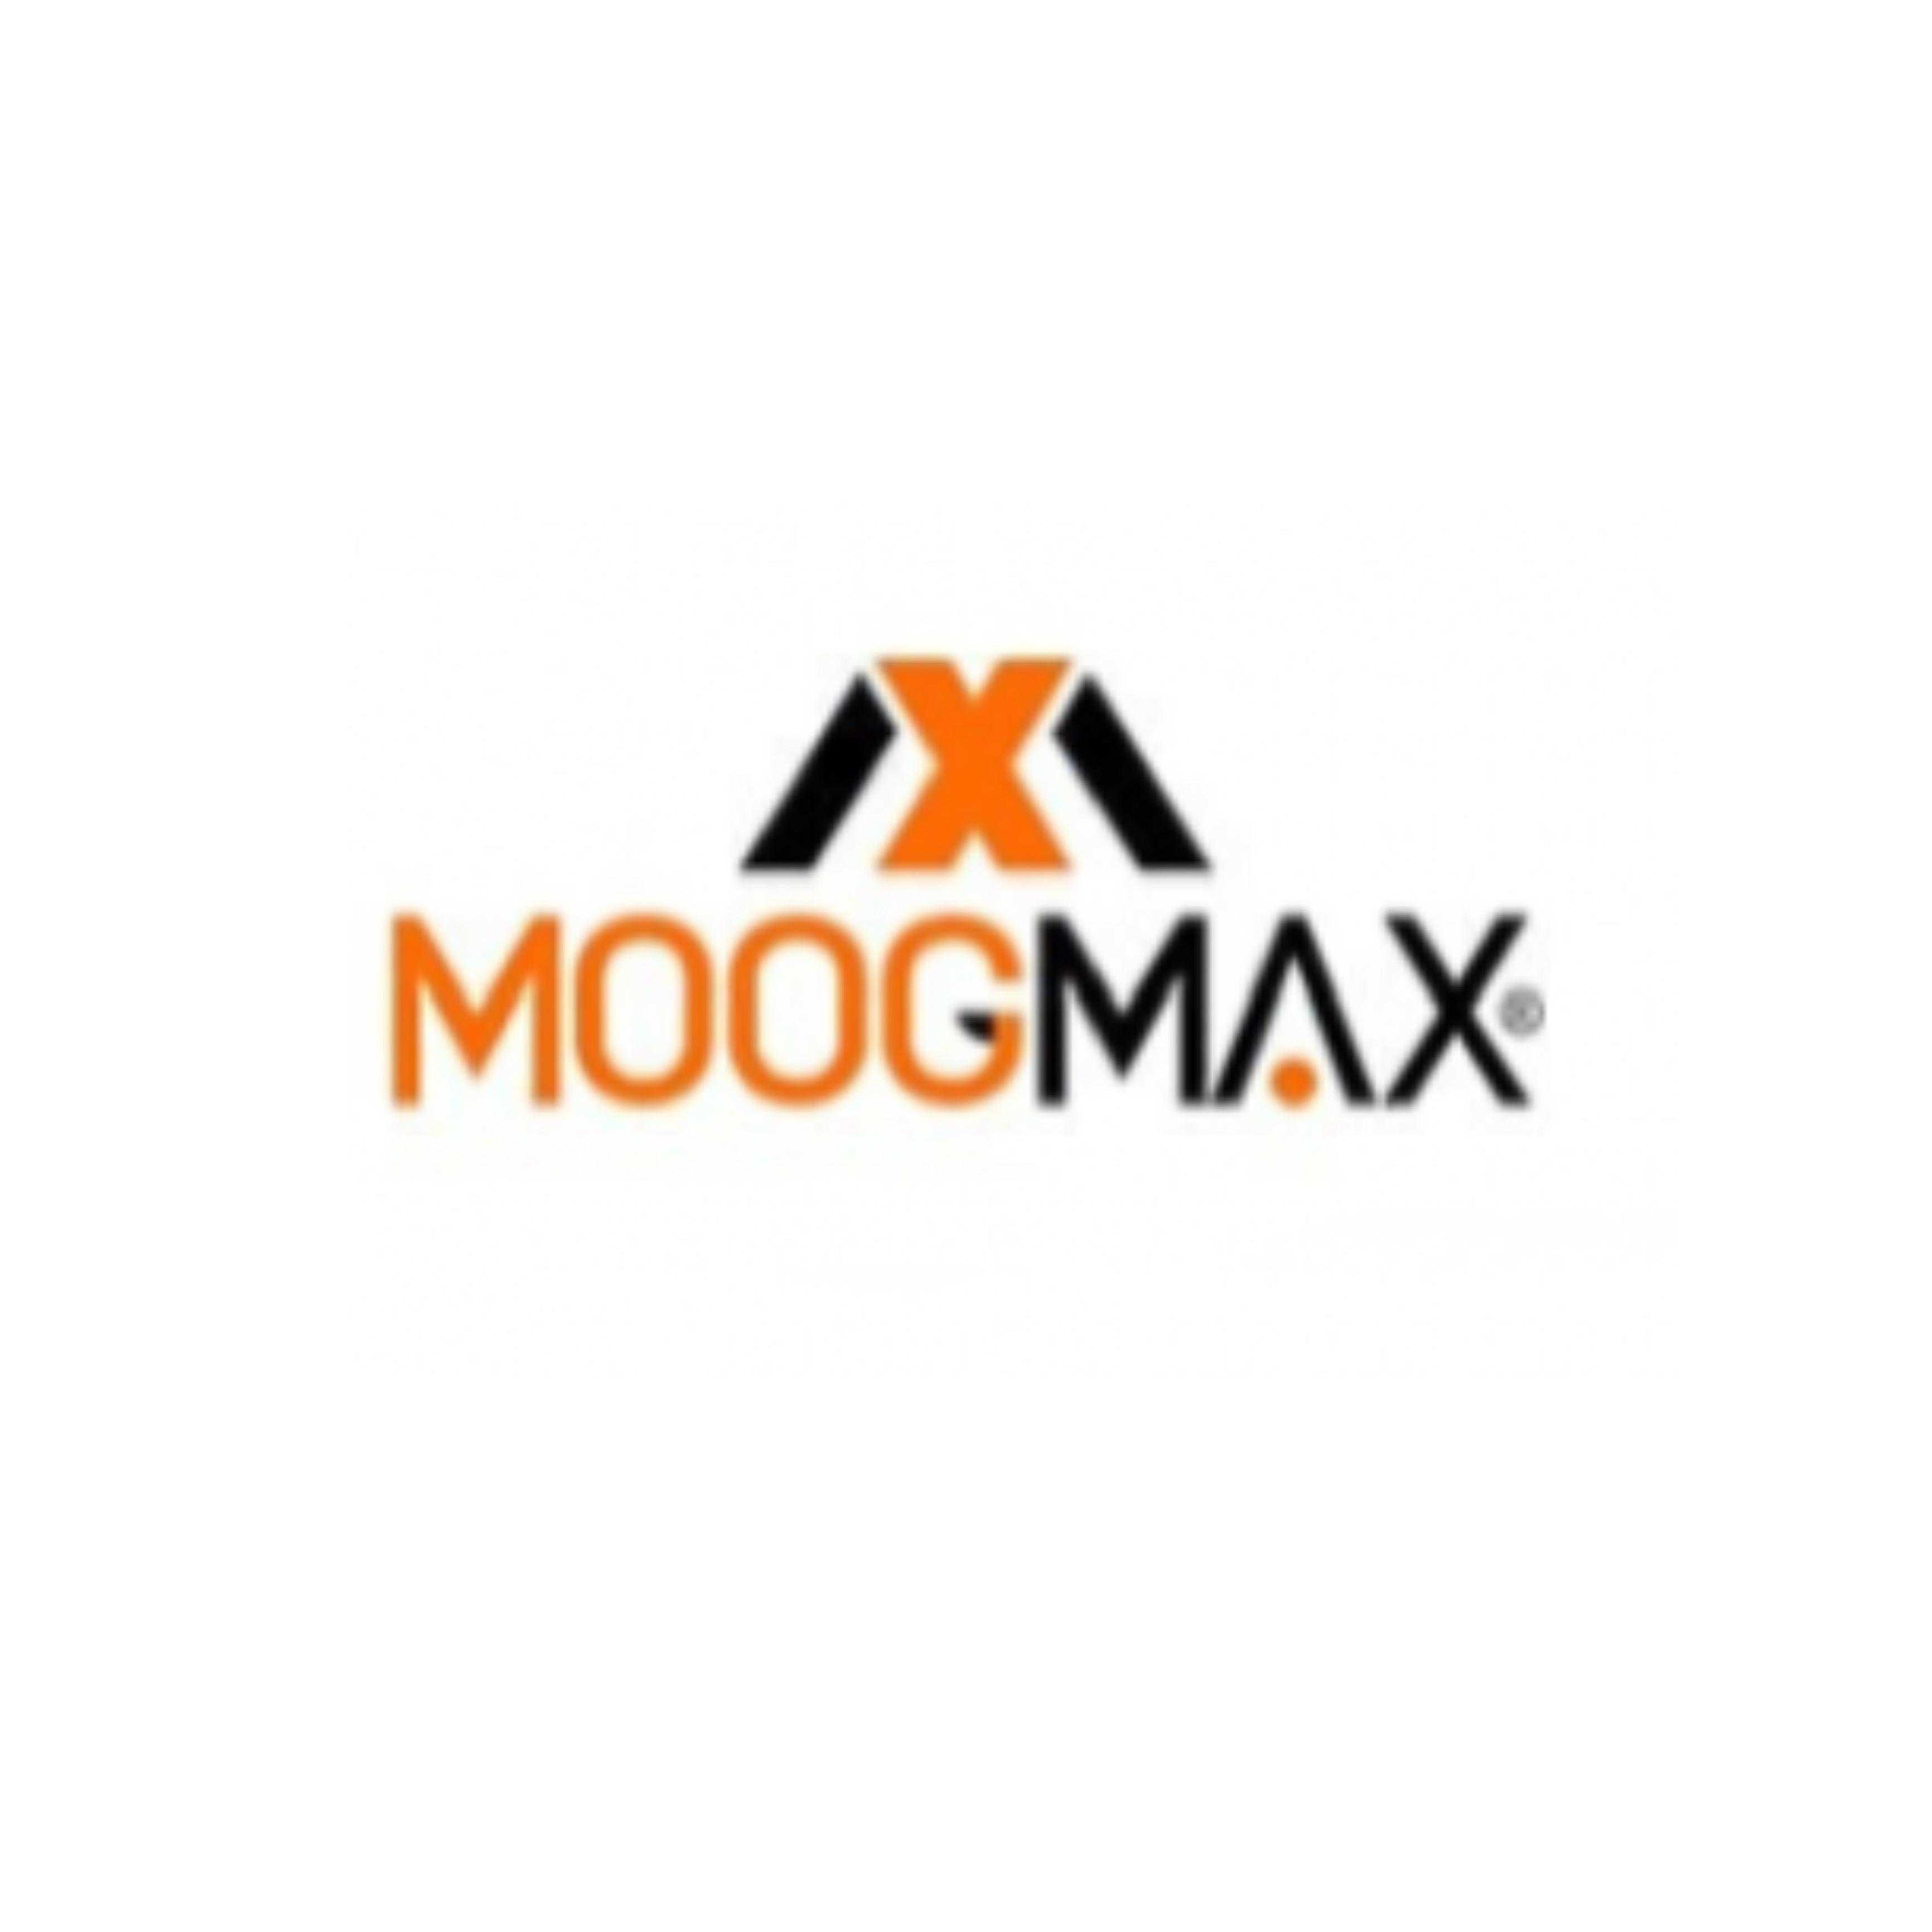 MOOGE MAX